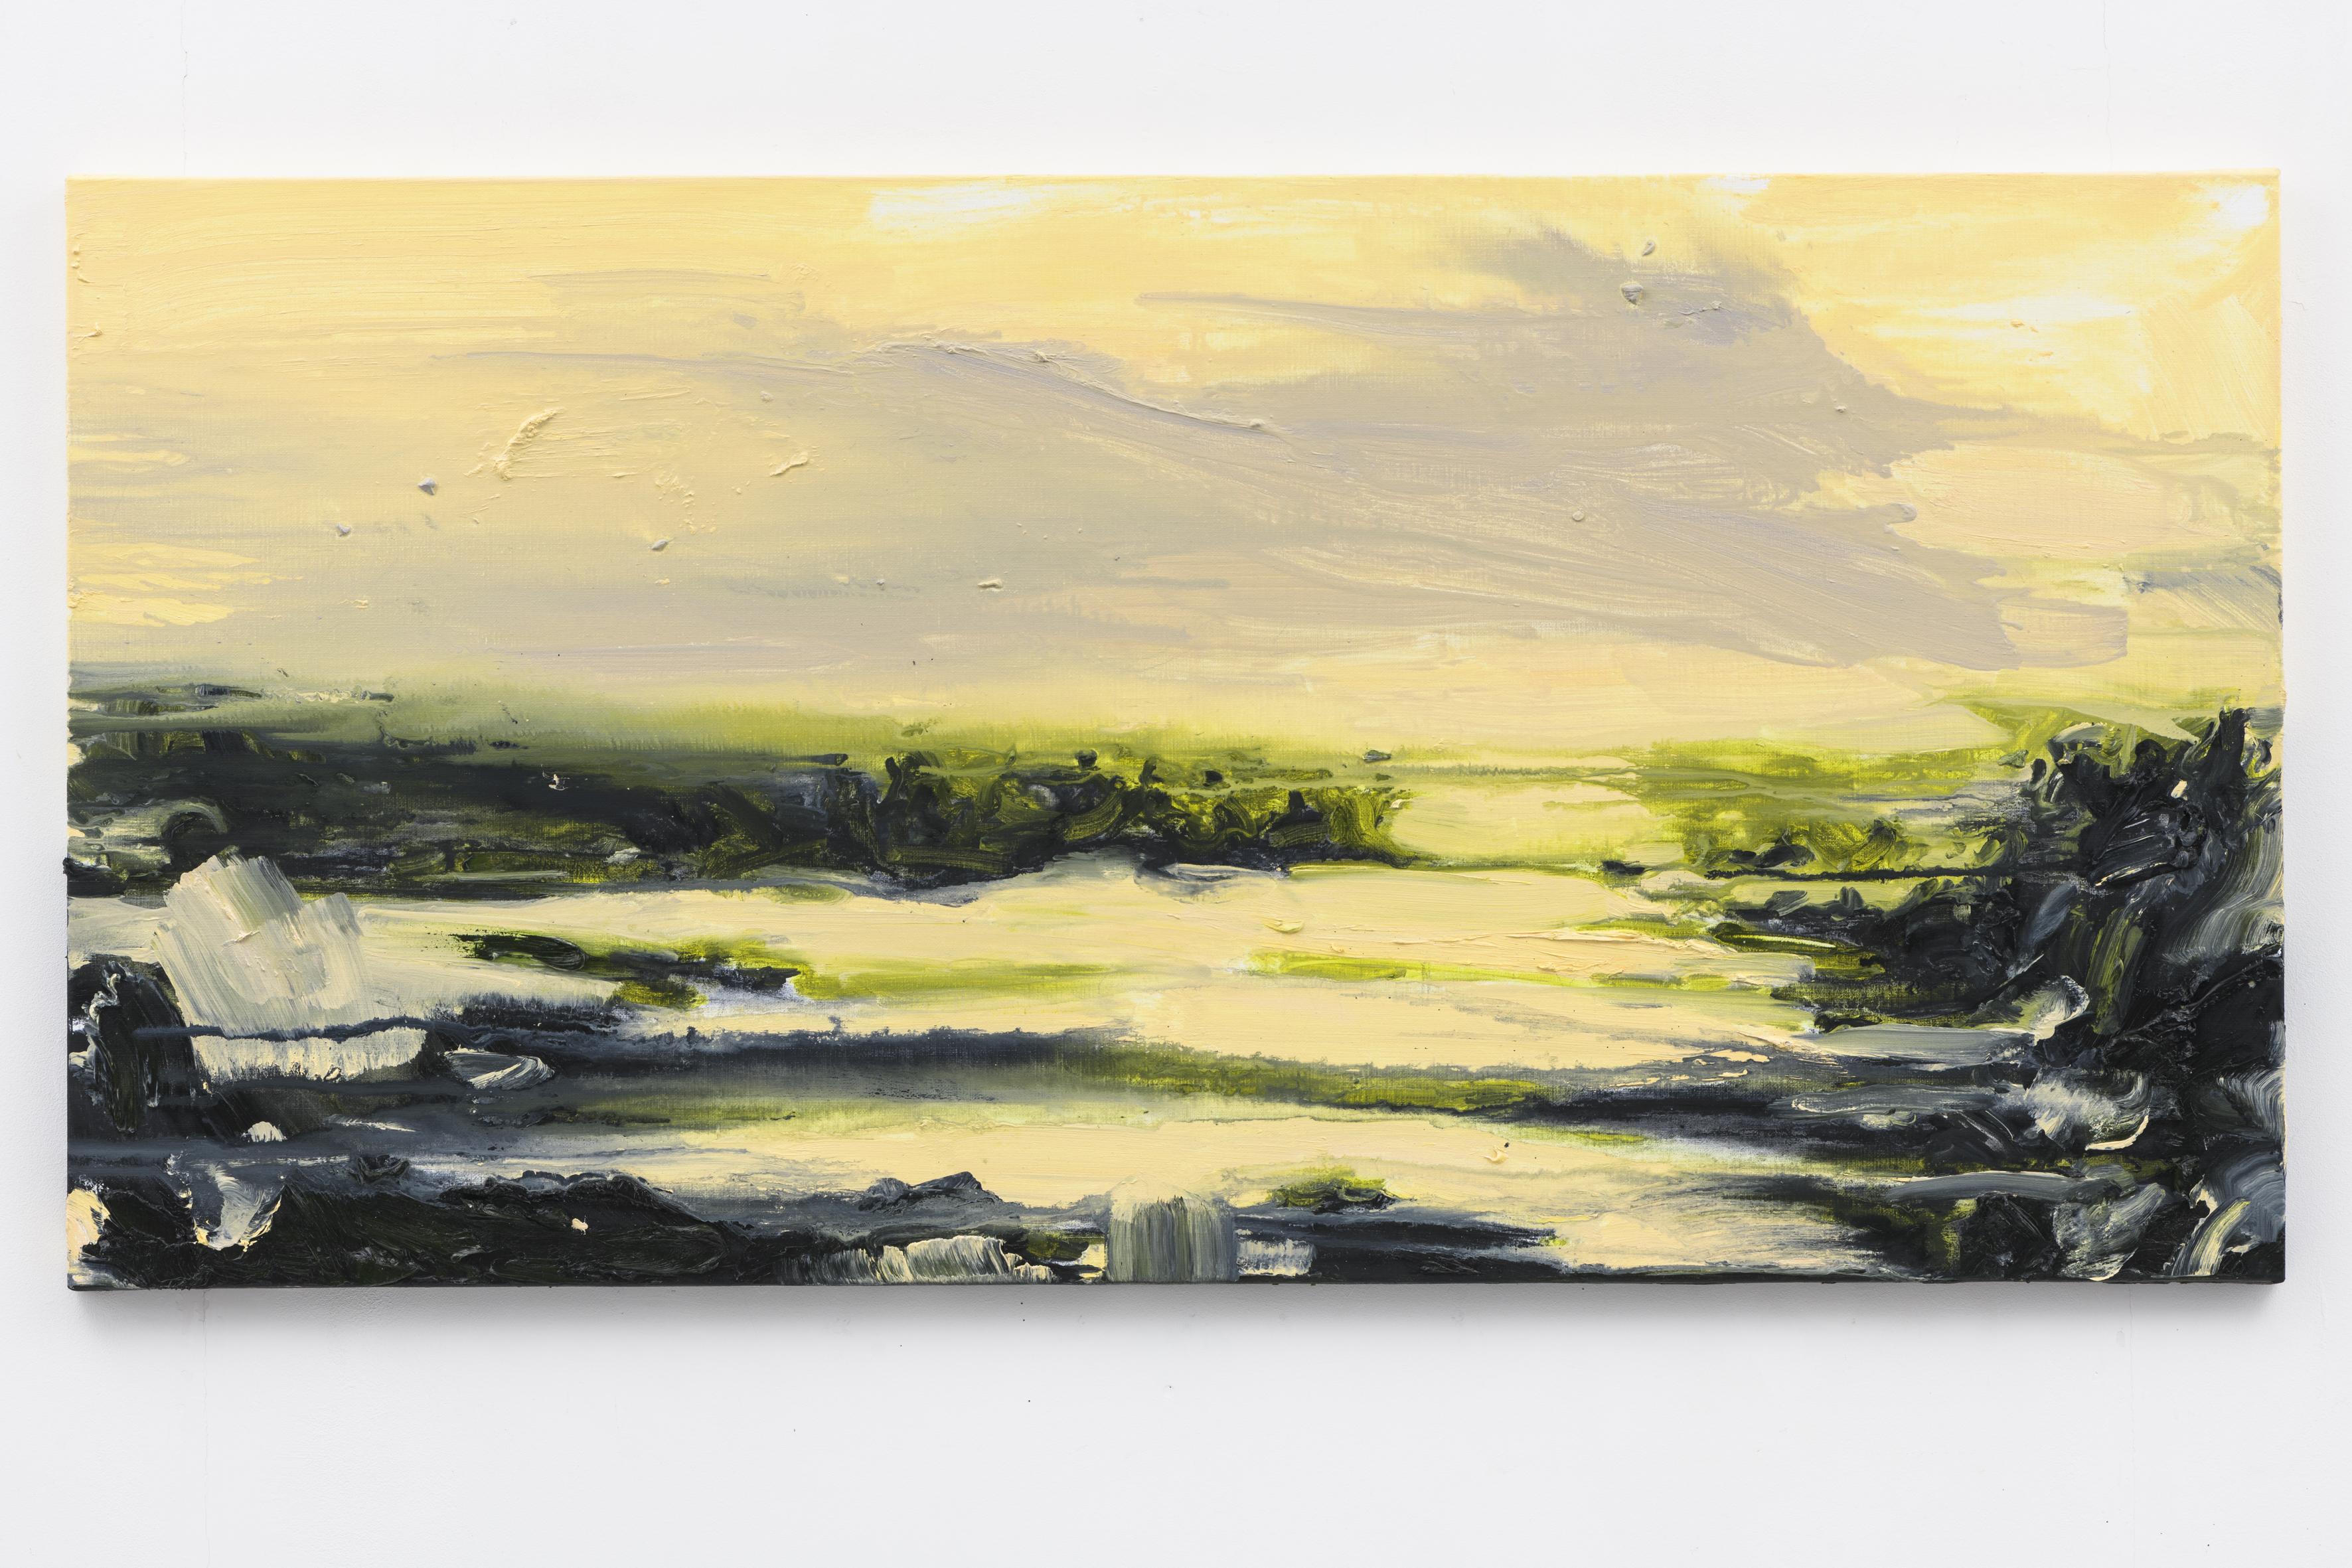 """Oude Buisse Heide I"" 70 x 140 cm. oil on linen 2017 (Air Van GoghHuis)"